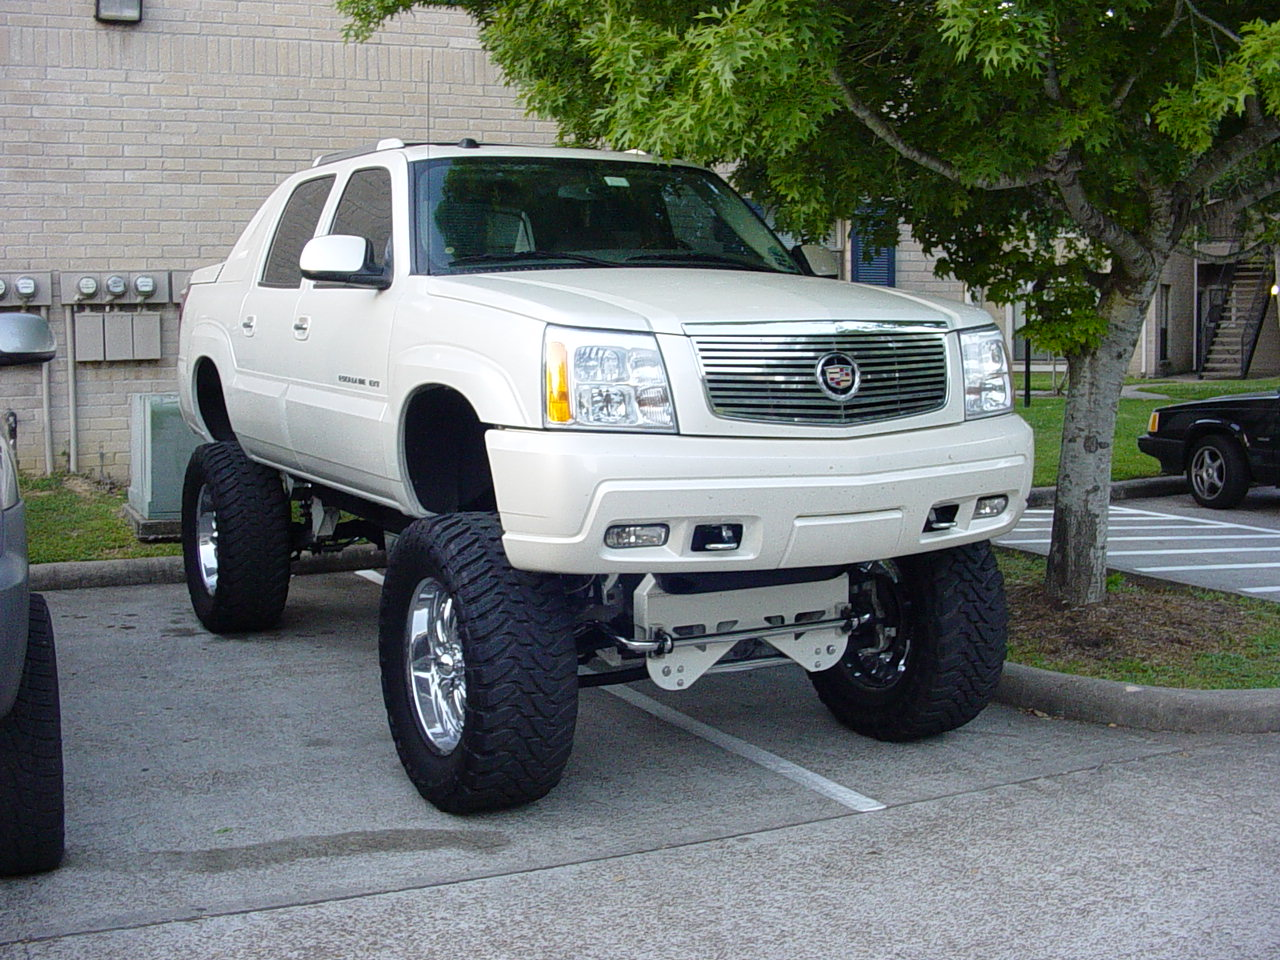 Cadillac Escalade Ext >> Lifted Escalade EXT in Houston - Clear Lake Area - Nissan Titan Forum